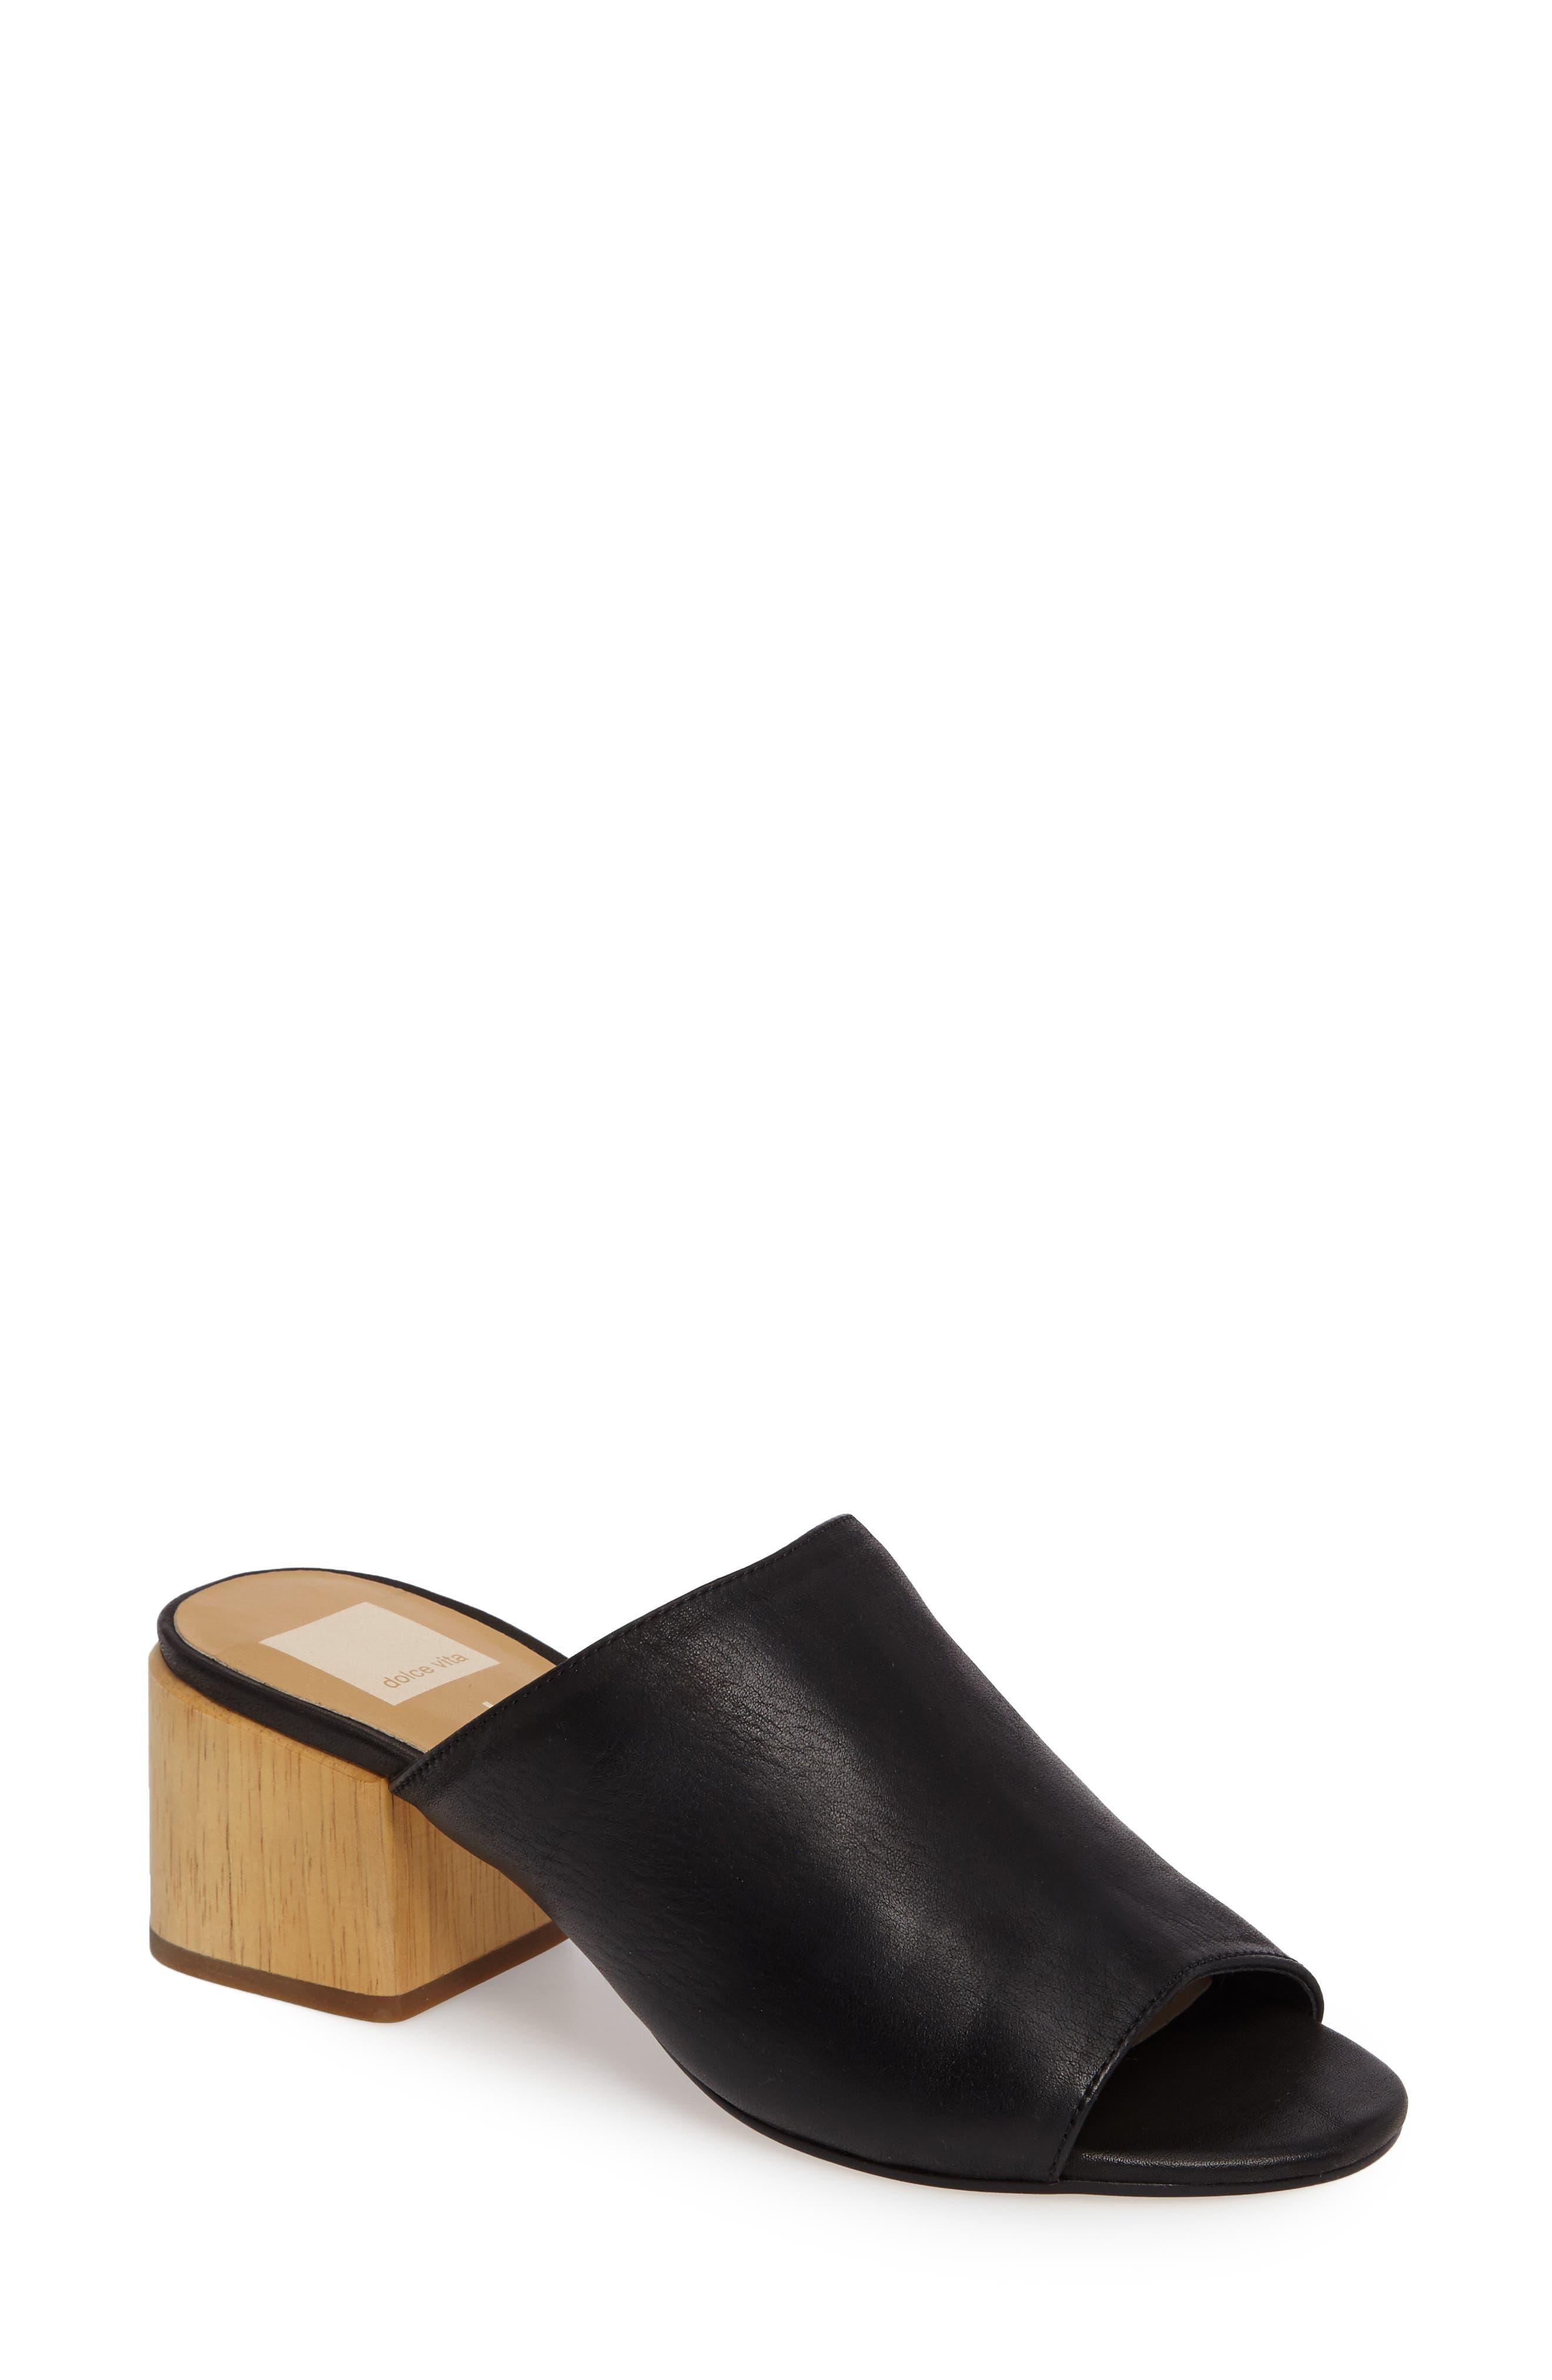 DOLCE VITA Shena Block Heel Slide Sandal